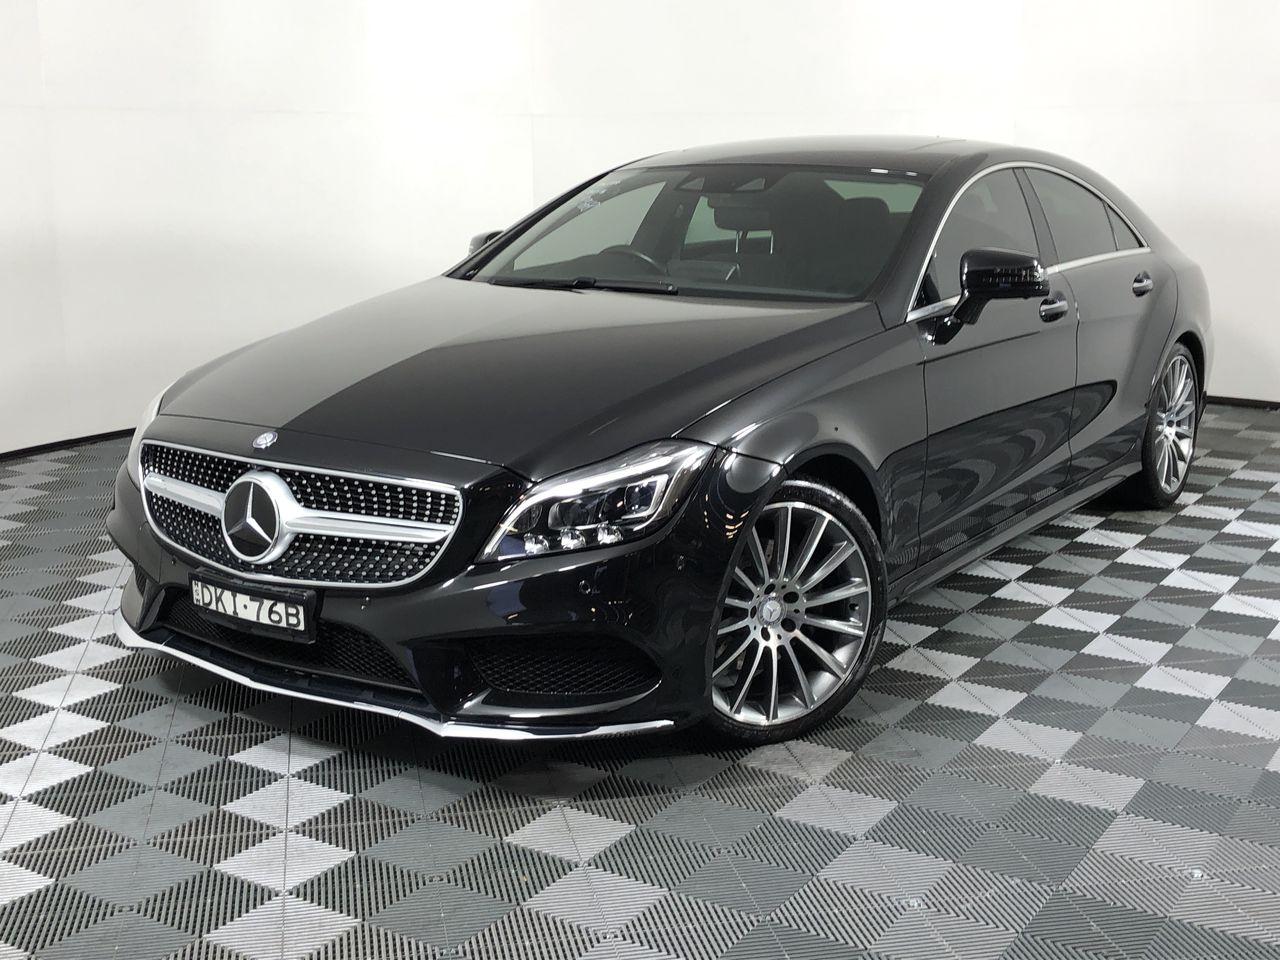 2016 Mercedes Benz CLS-Class CLS 250 D C218 Turbo Diesel Automatic Coupe